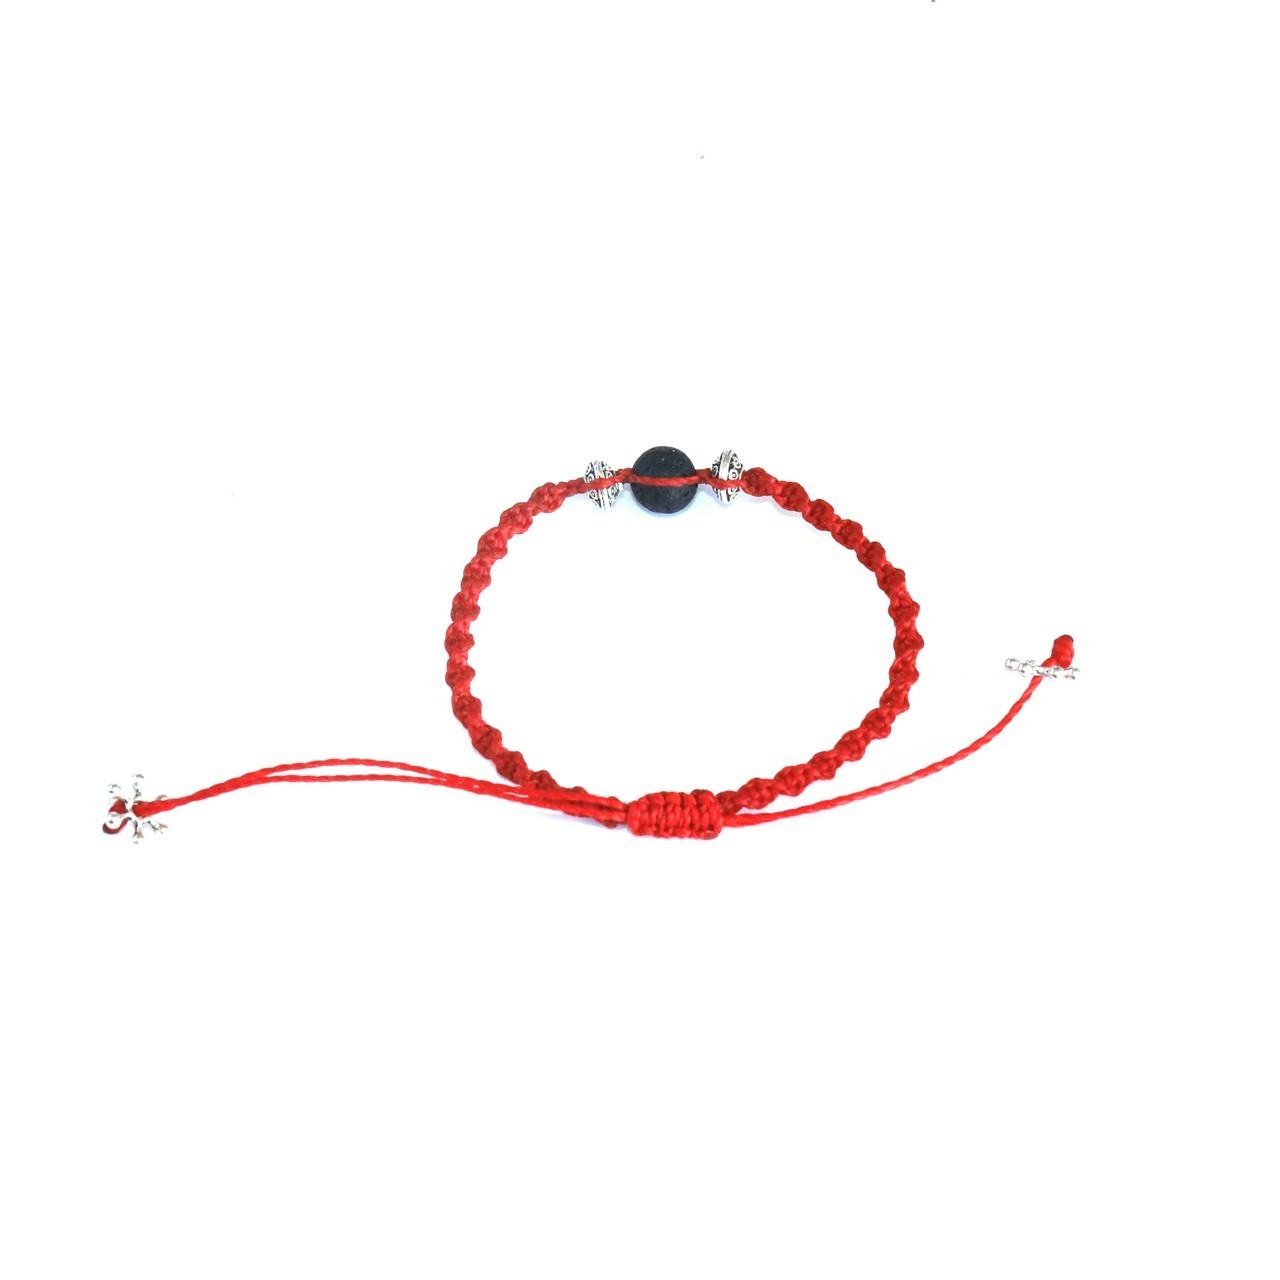 Hot Sauce Diffuser Bracelet